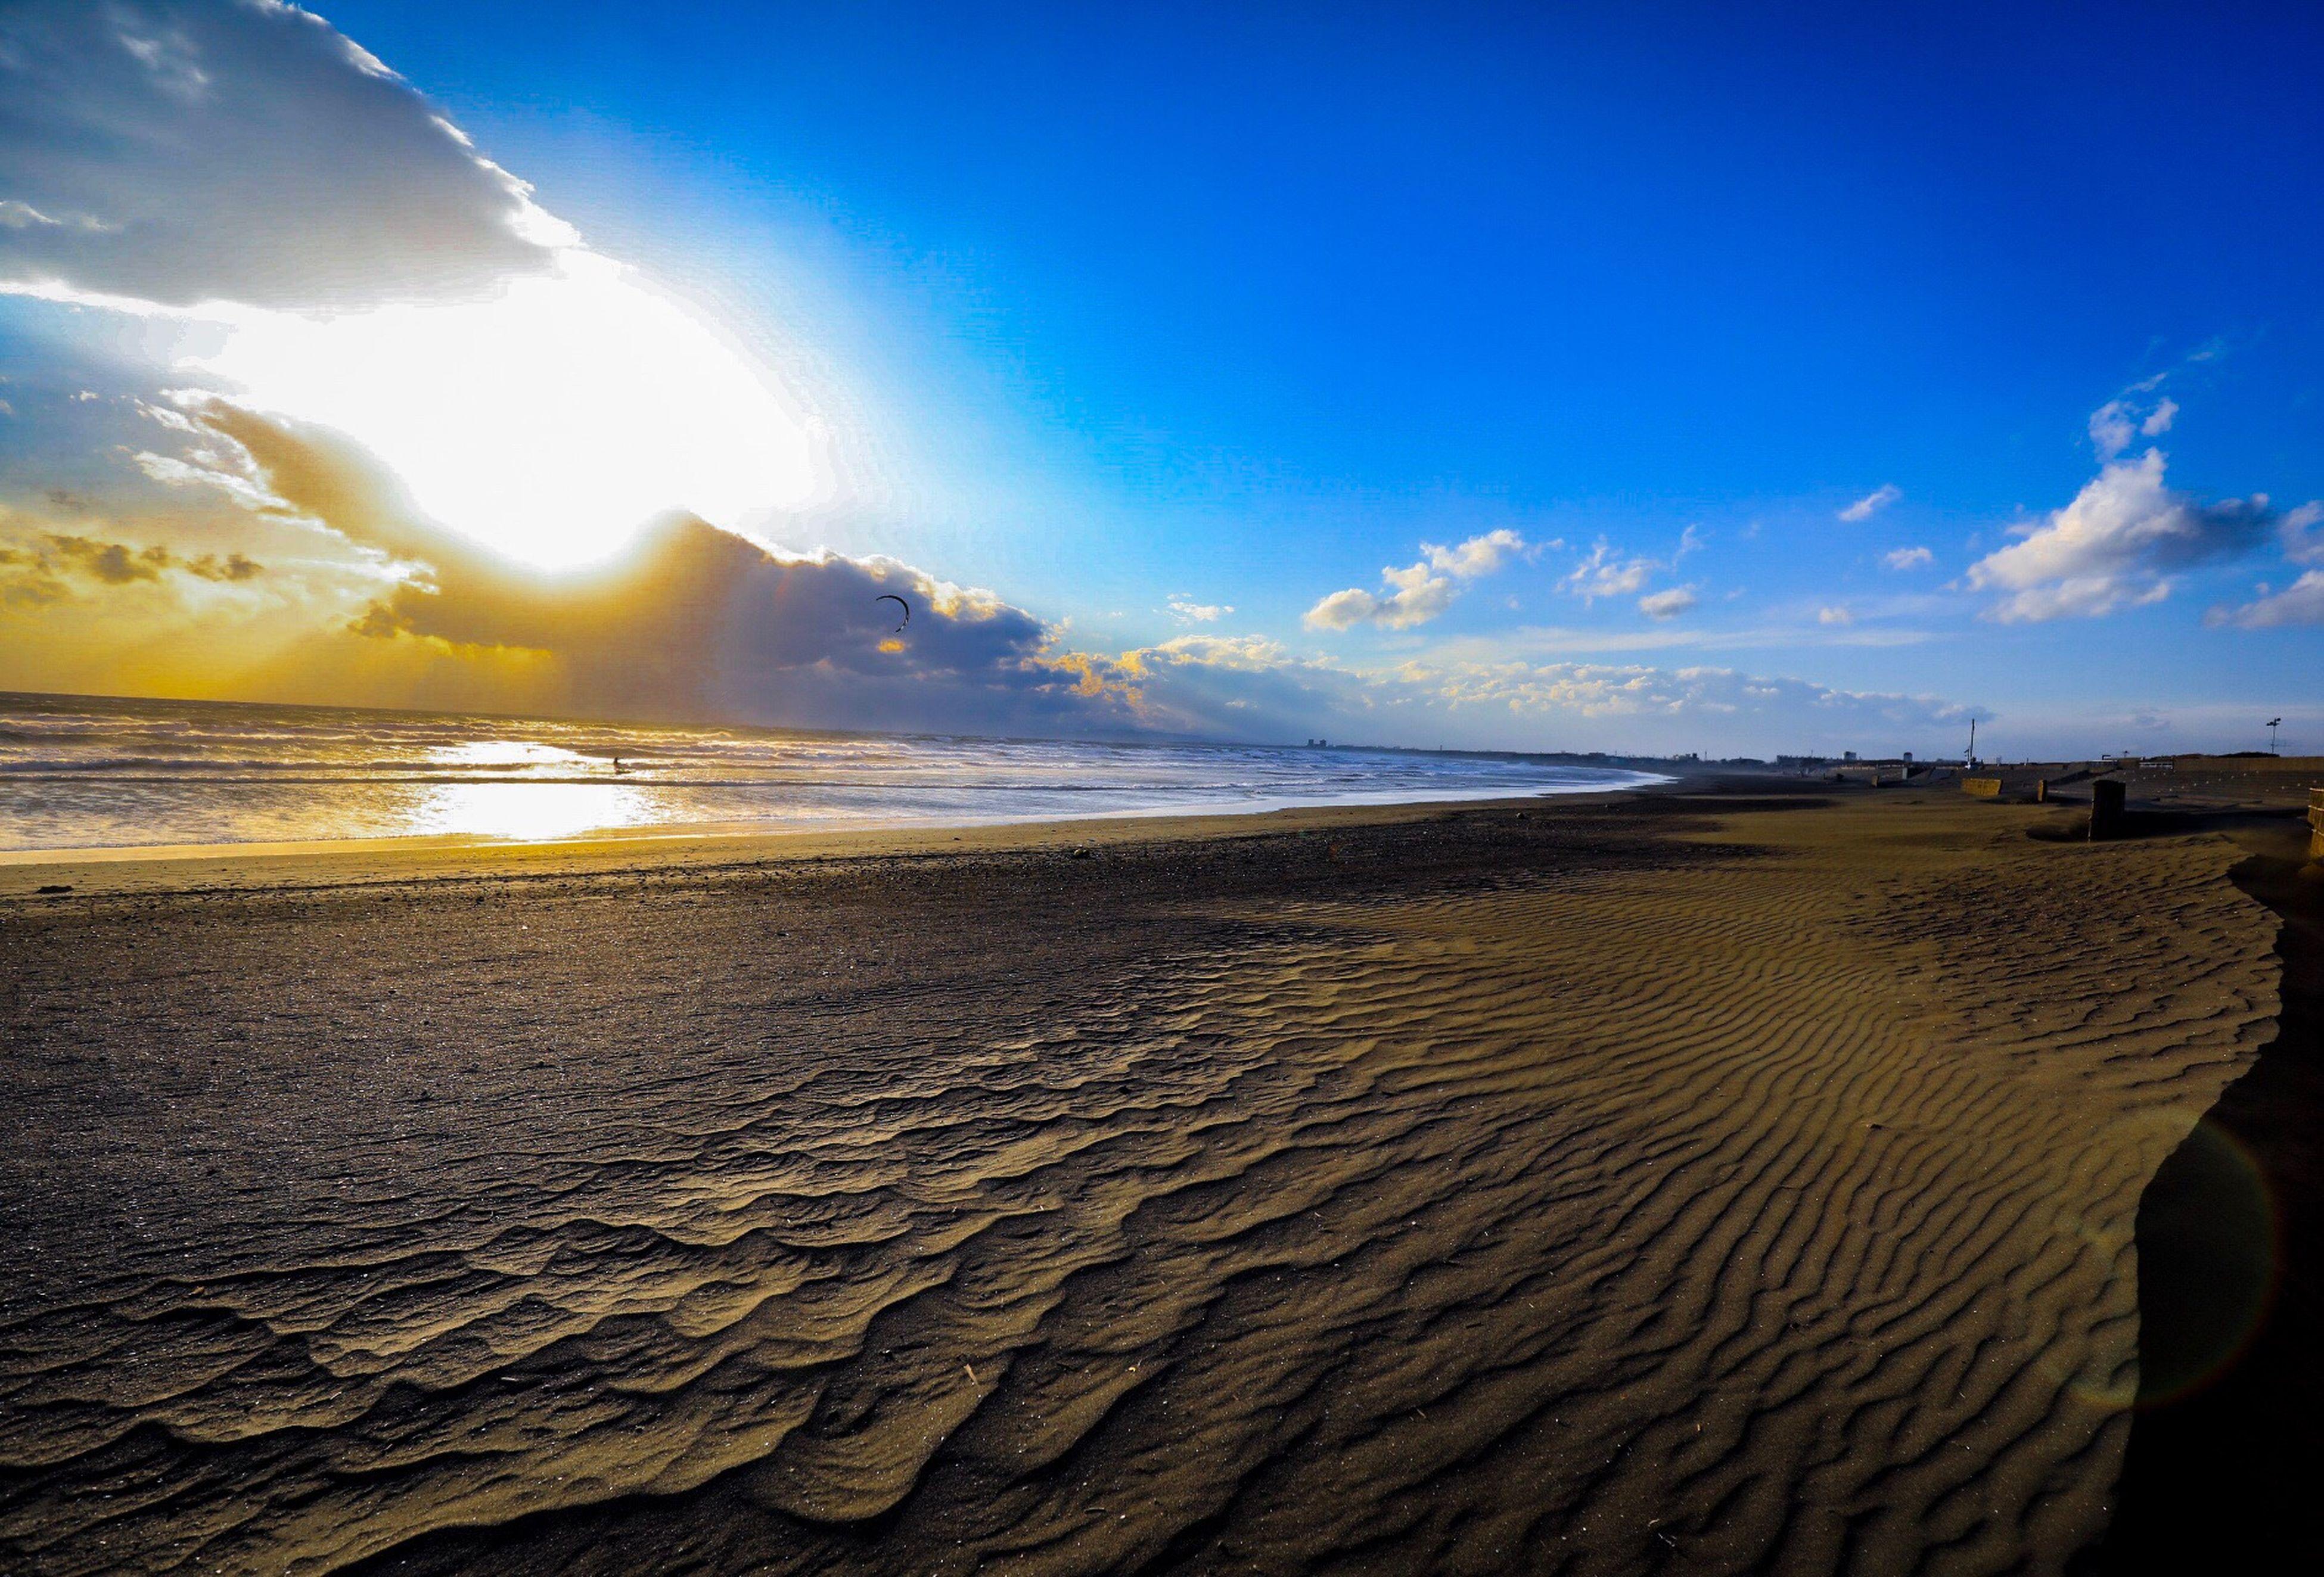 sand, sky, sunlight, nature, beach, sea, scenics, beauty in nature, outdoors, sun, sunbeam, sunset, tranquil scene, horizon over water, no people, day, water, sand dune